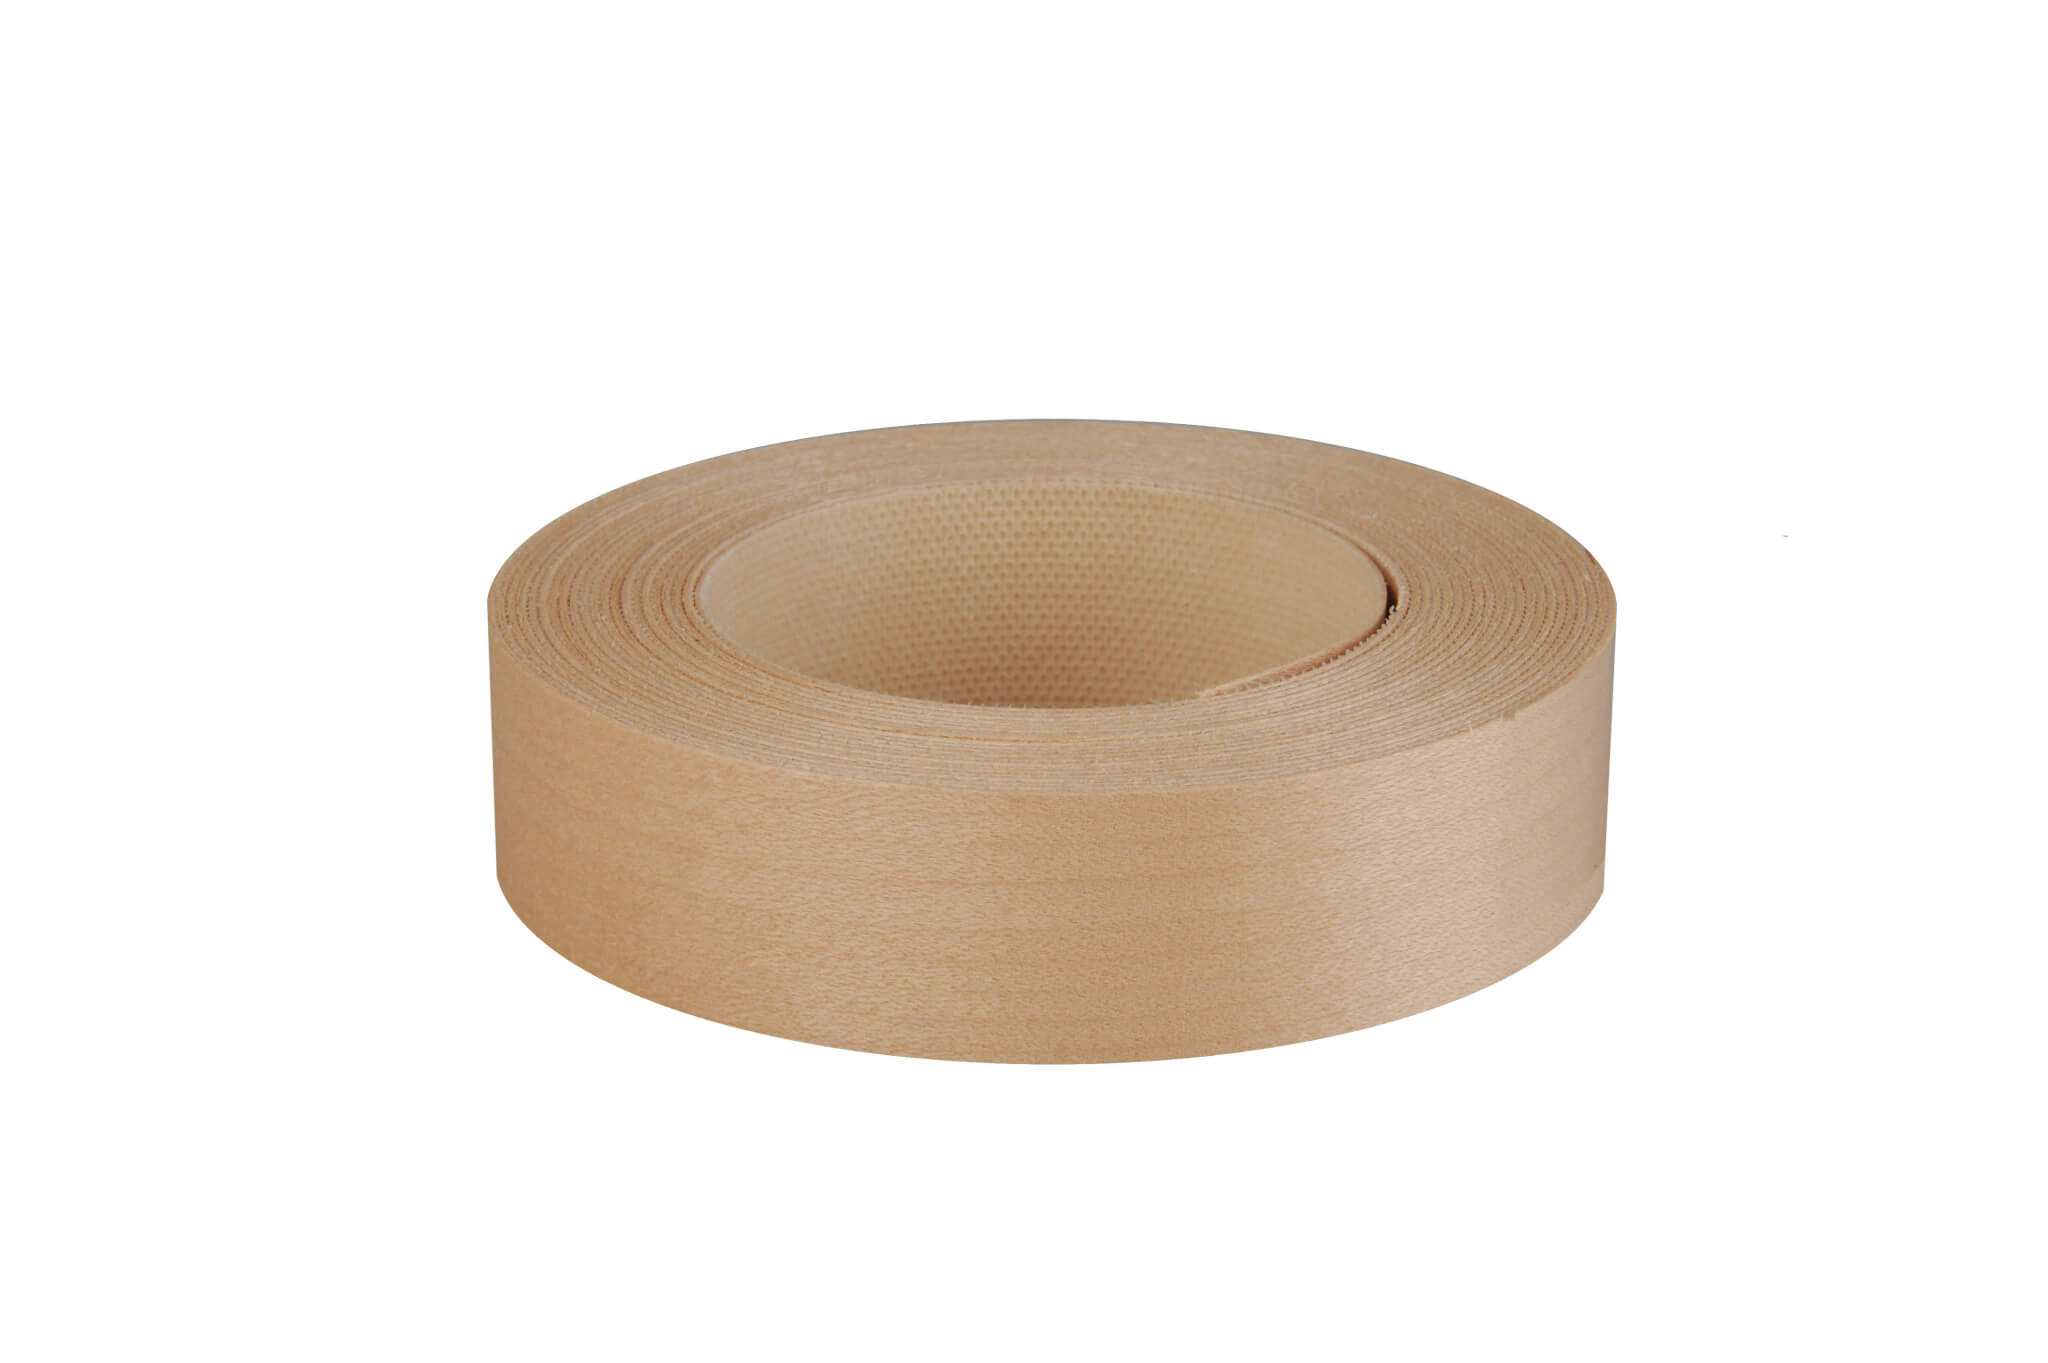 Sptd bandes de chant en bois v ritable adh sif ou thermocollant - Placage bois adhesif ...